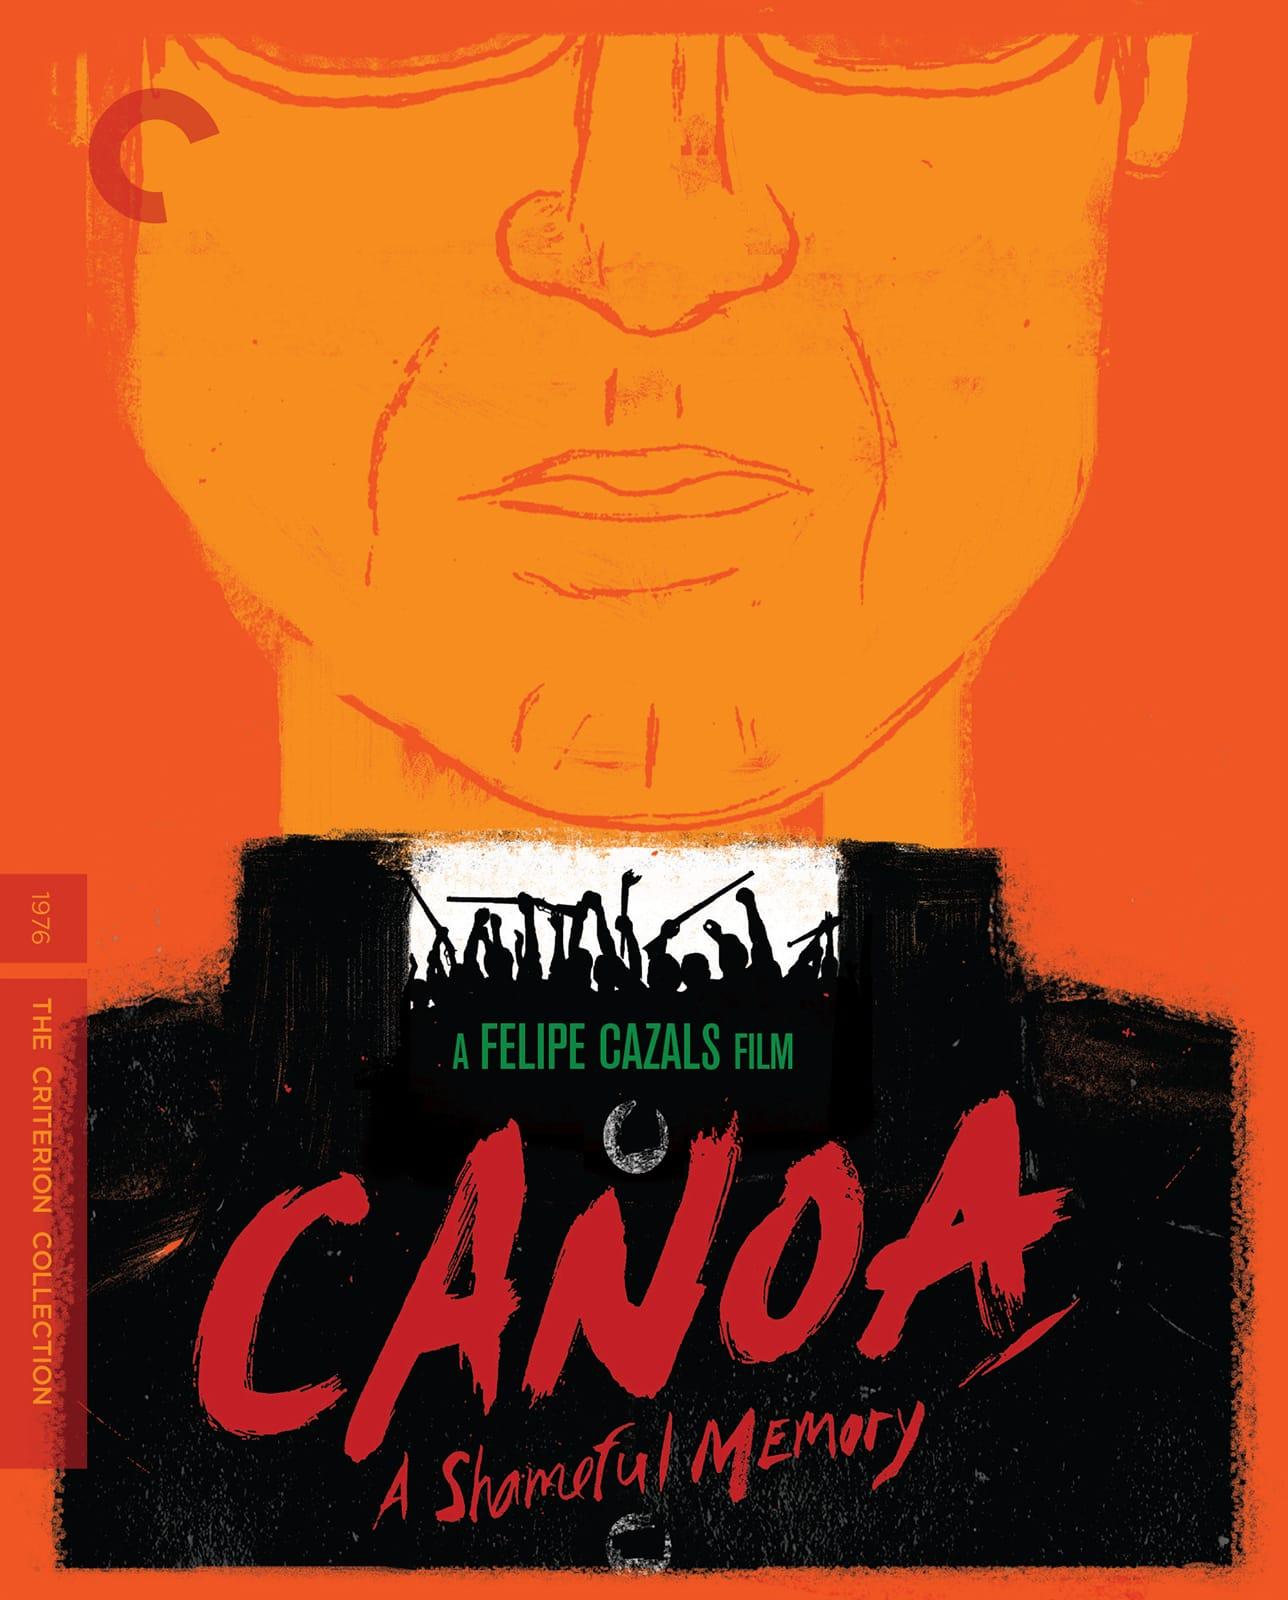 Canoa: A Shameful Memory